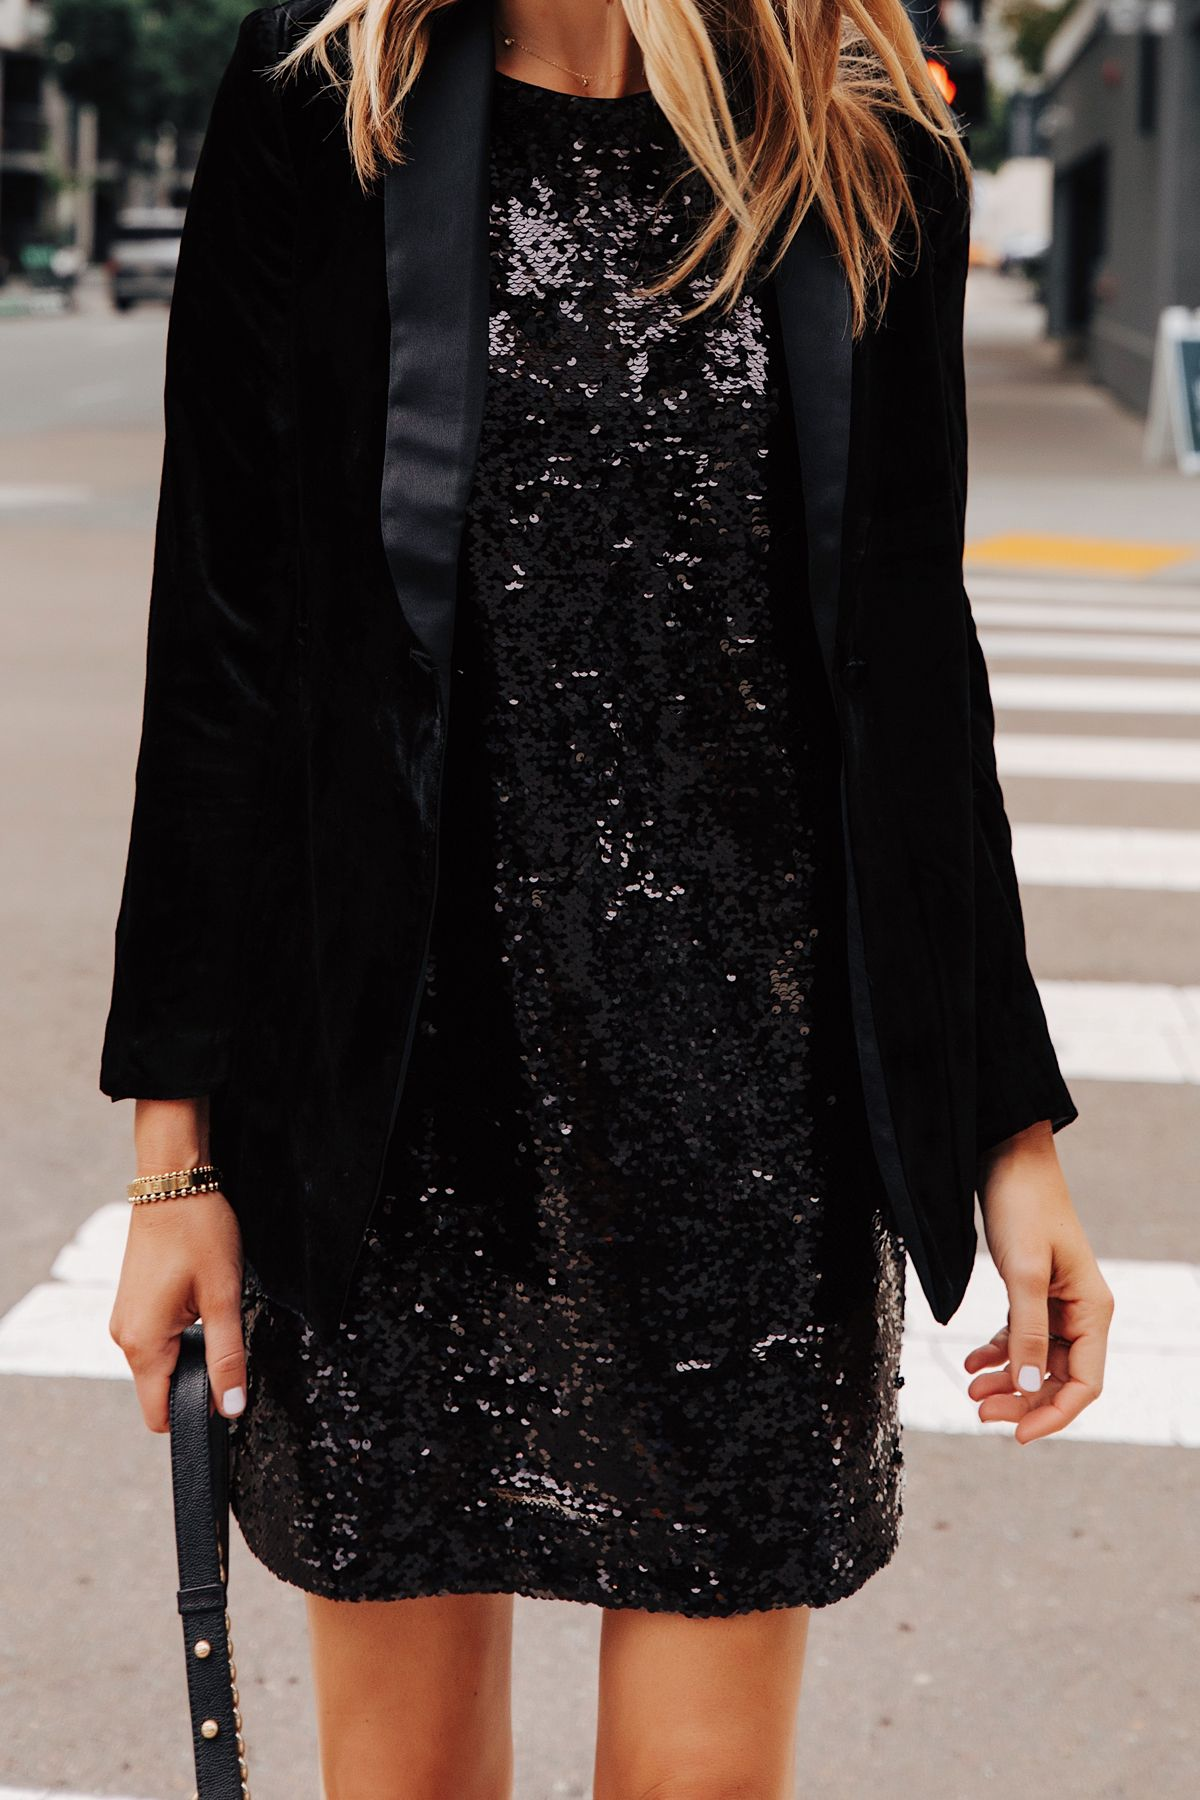 Pin By Liv Offbeat On Fashionjackson Fashion Fashion Jackson Black Blazer Outfit [ 1800 x 1200 Pixel ]